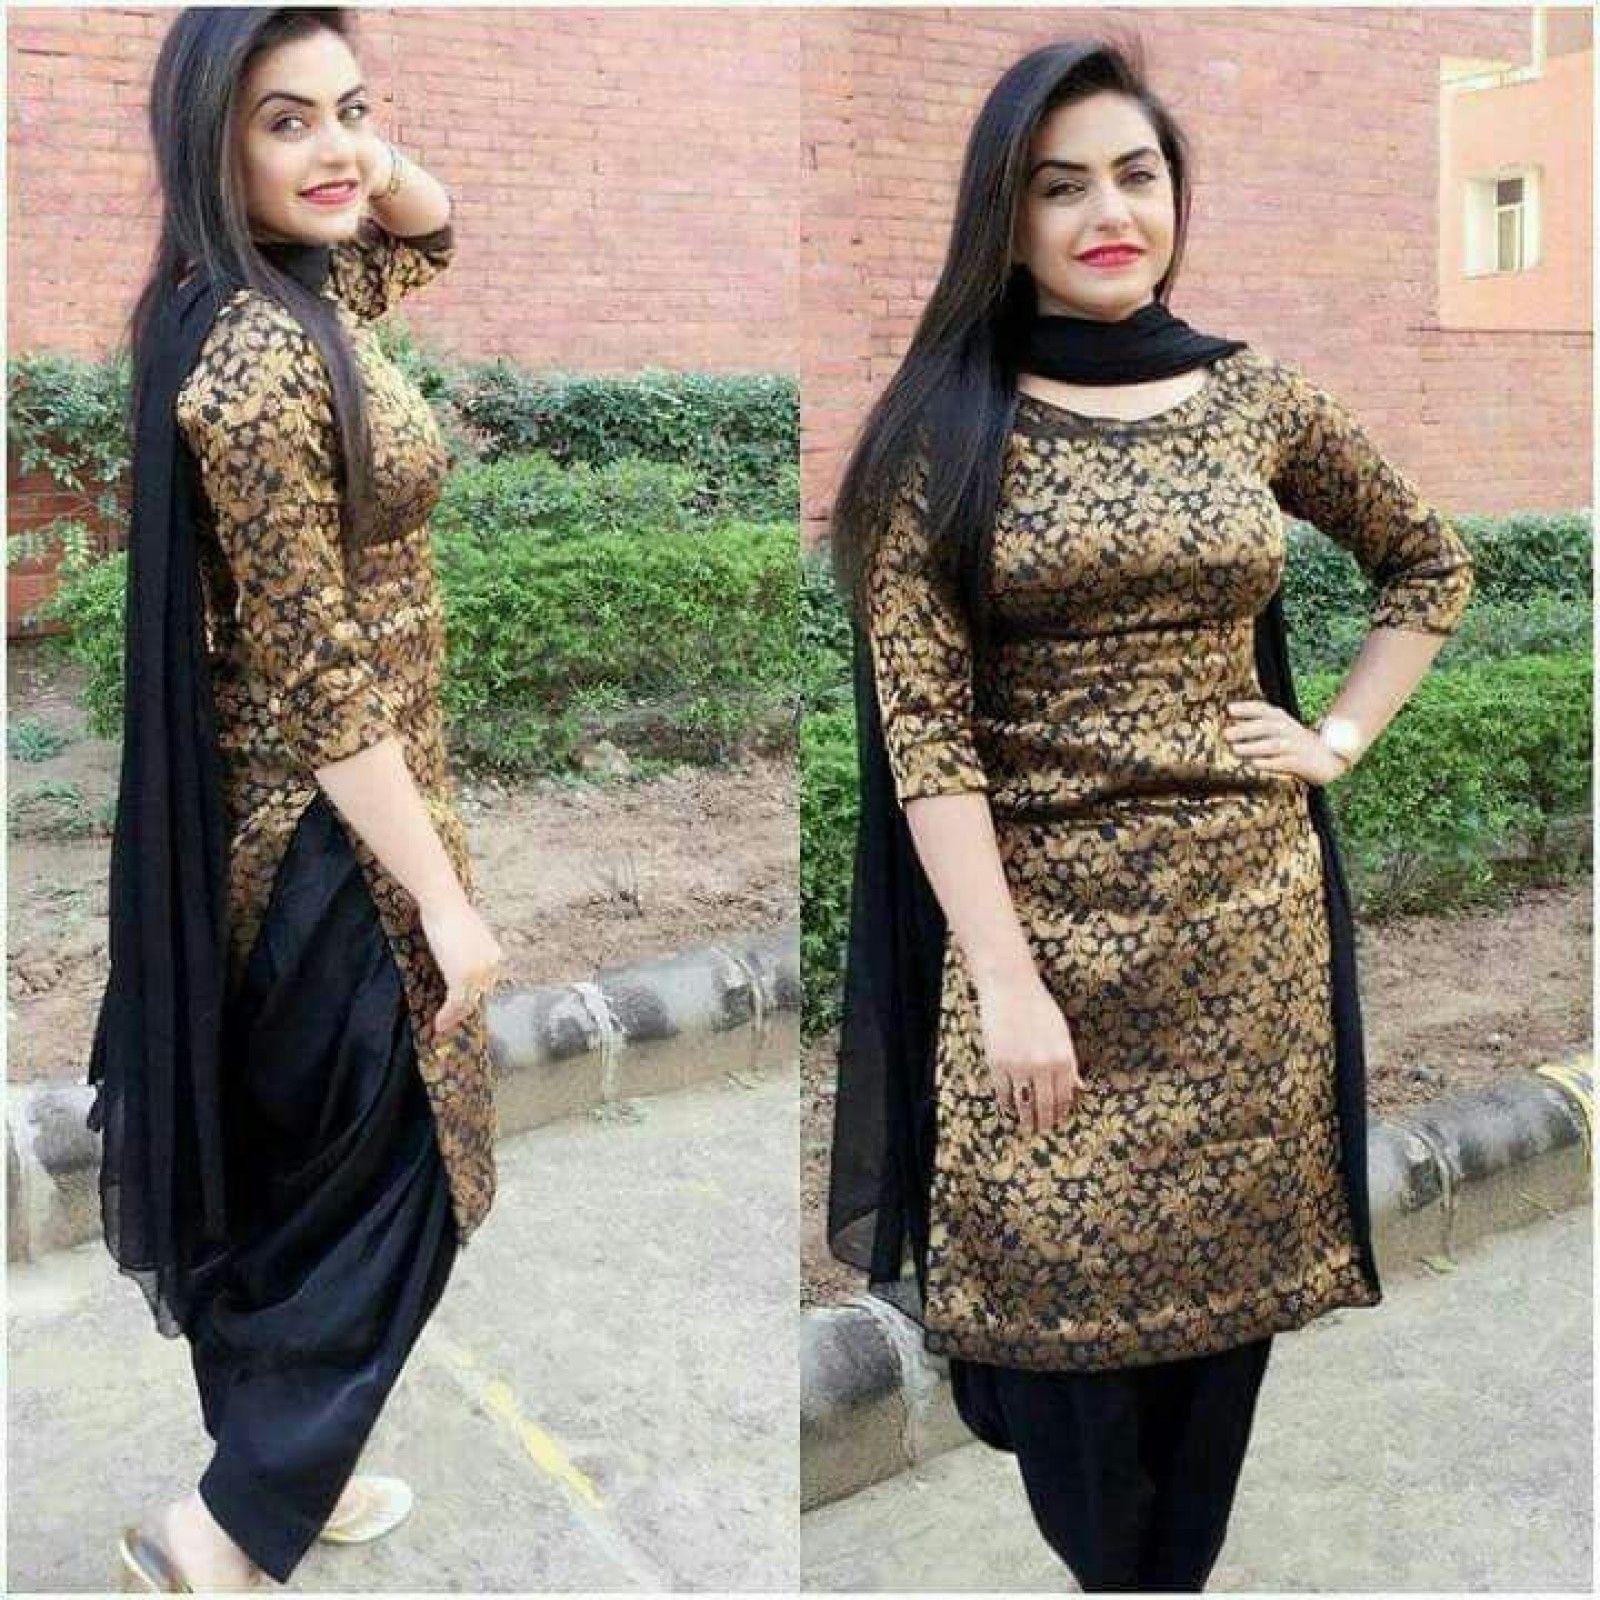 e3d7ebf289 Brocade UnStitched Salwar Suit Dress Material (Black) in 2019 ...